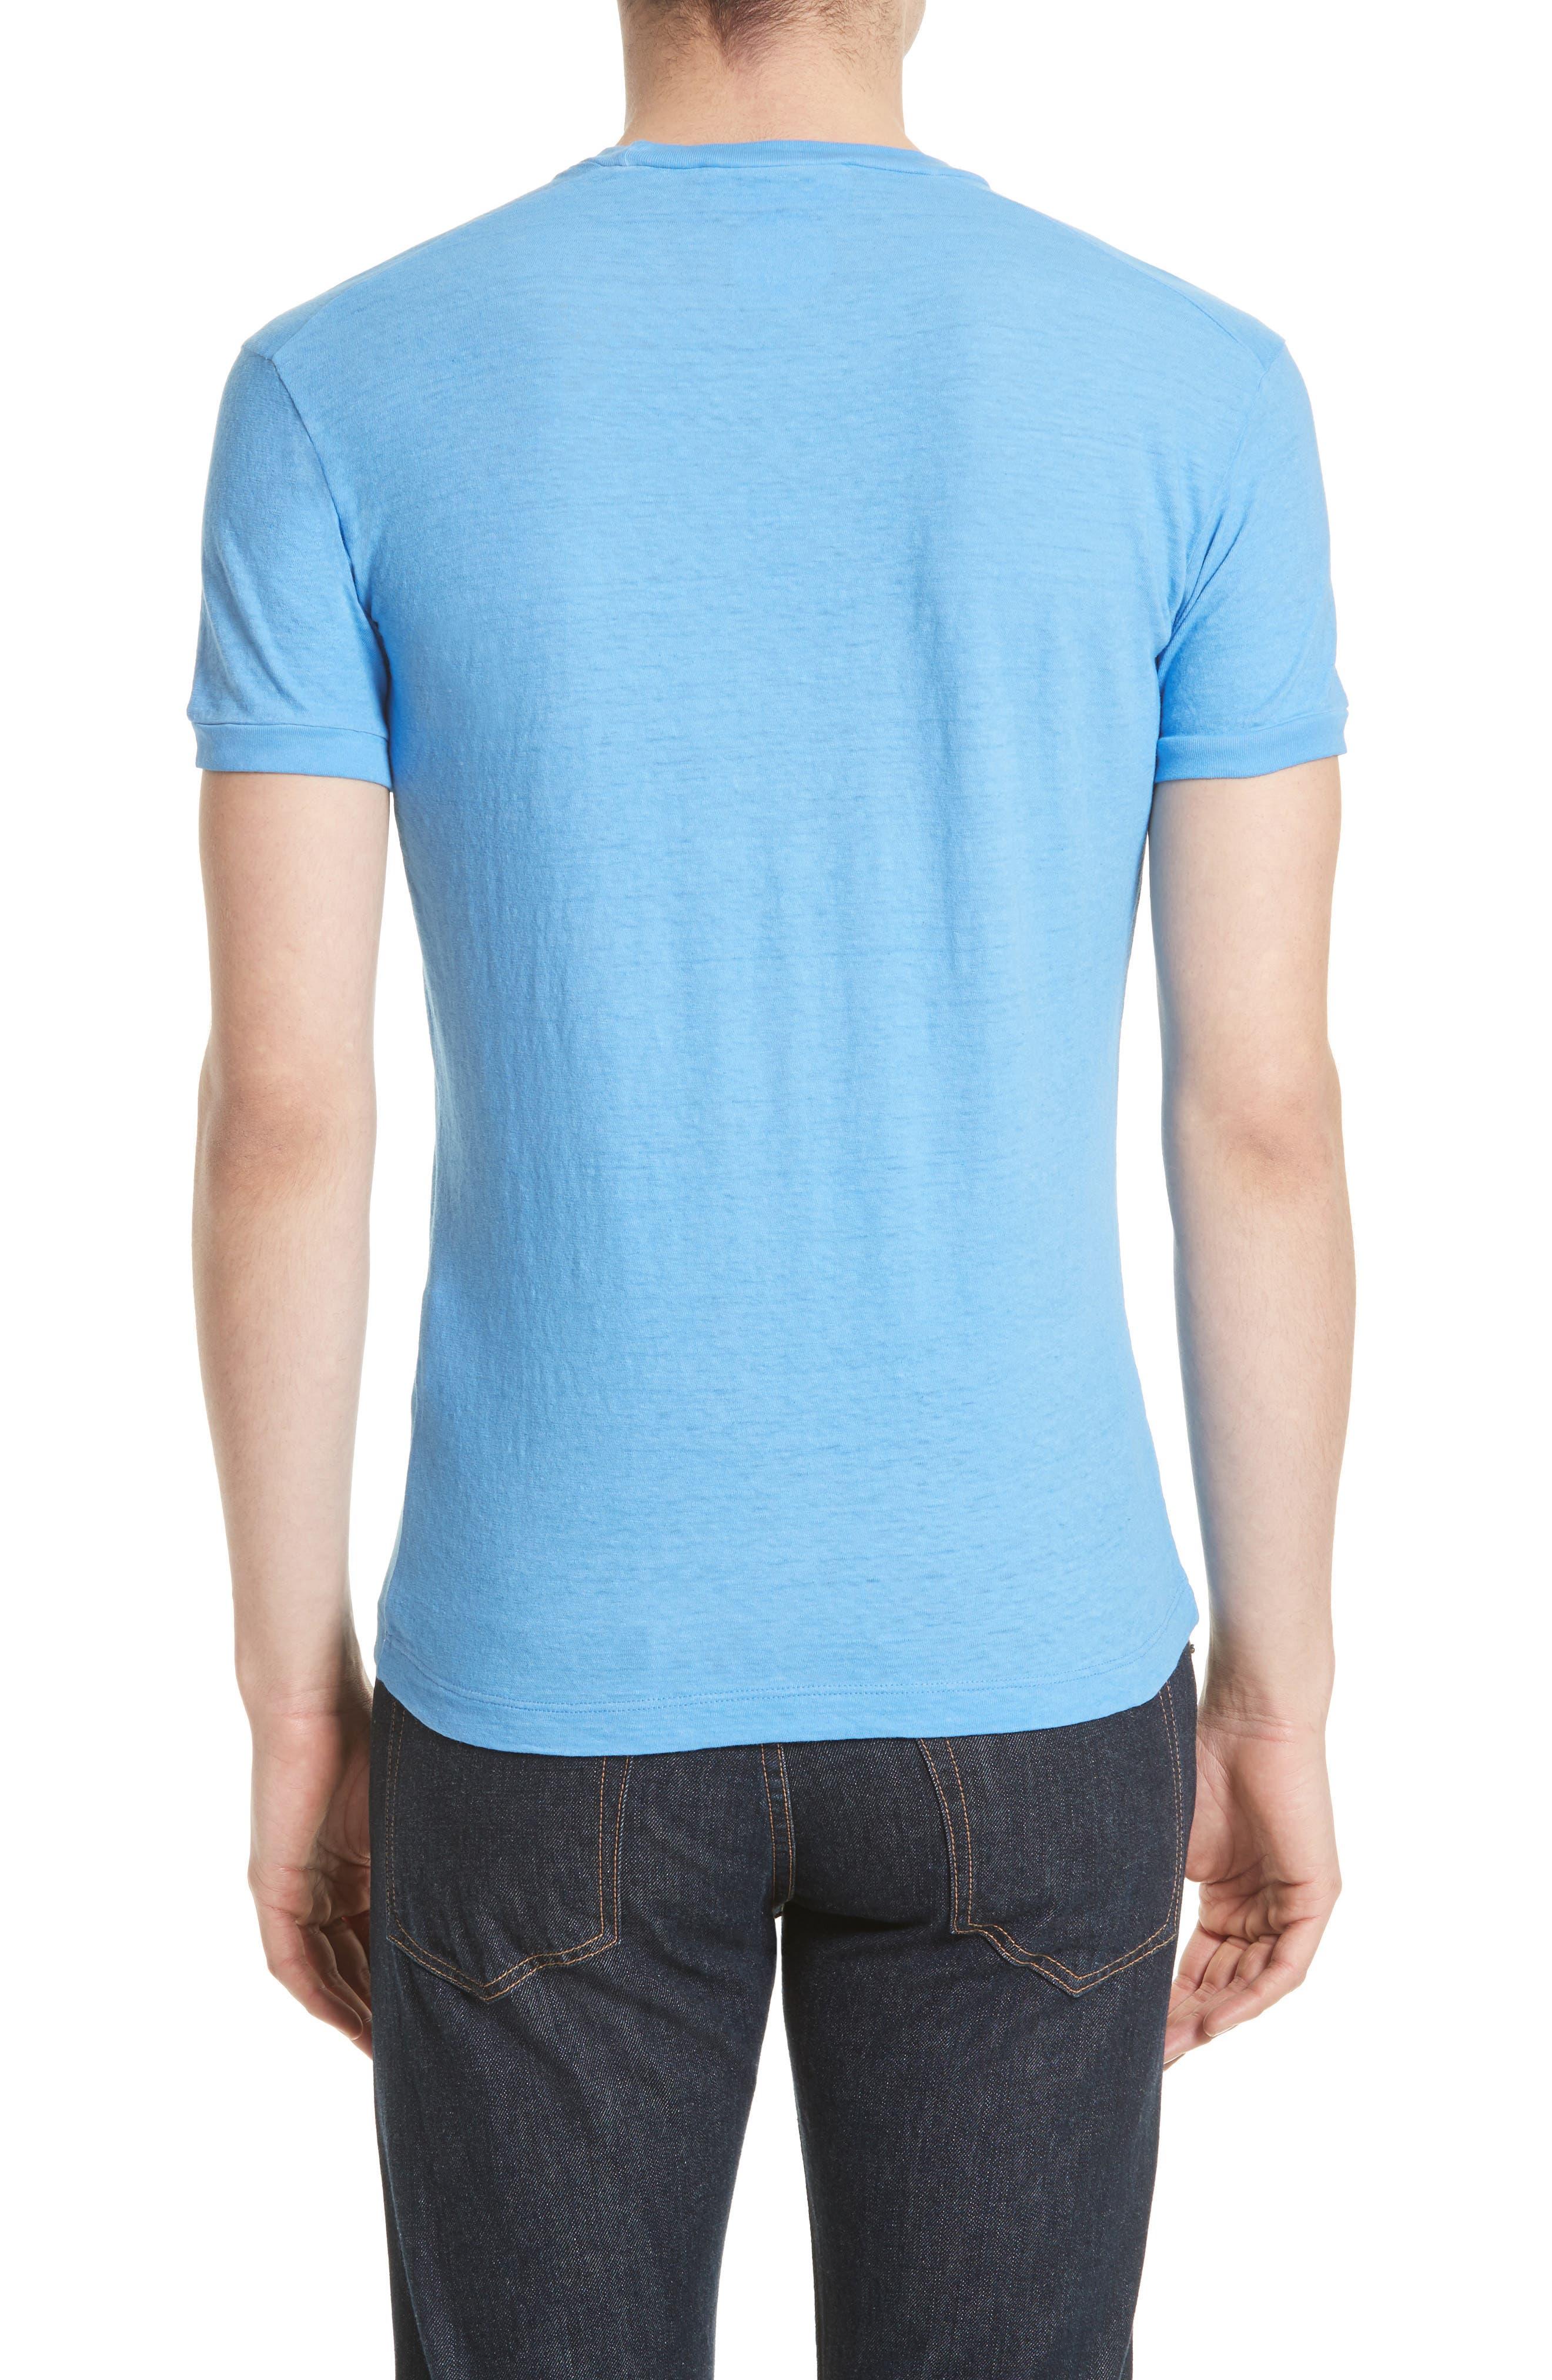 Dquared2 Cotton T-Shirt,                             Alternate thumbnail 2, color,                             449